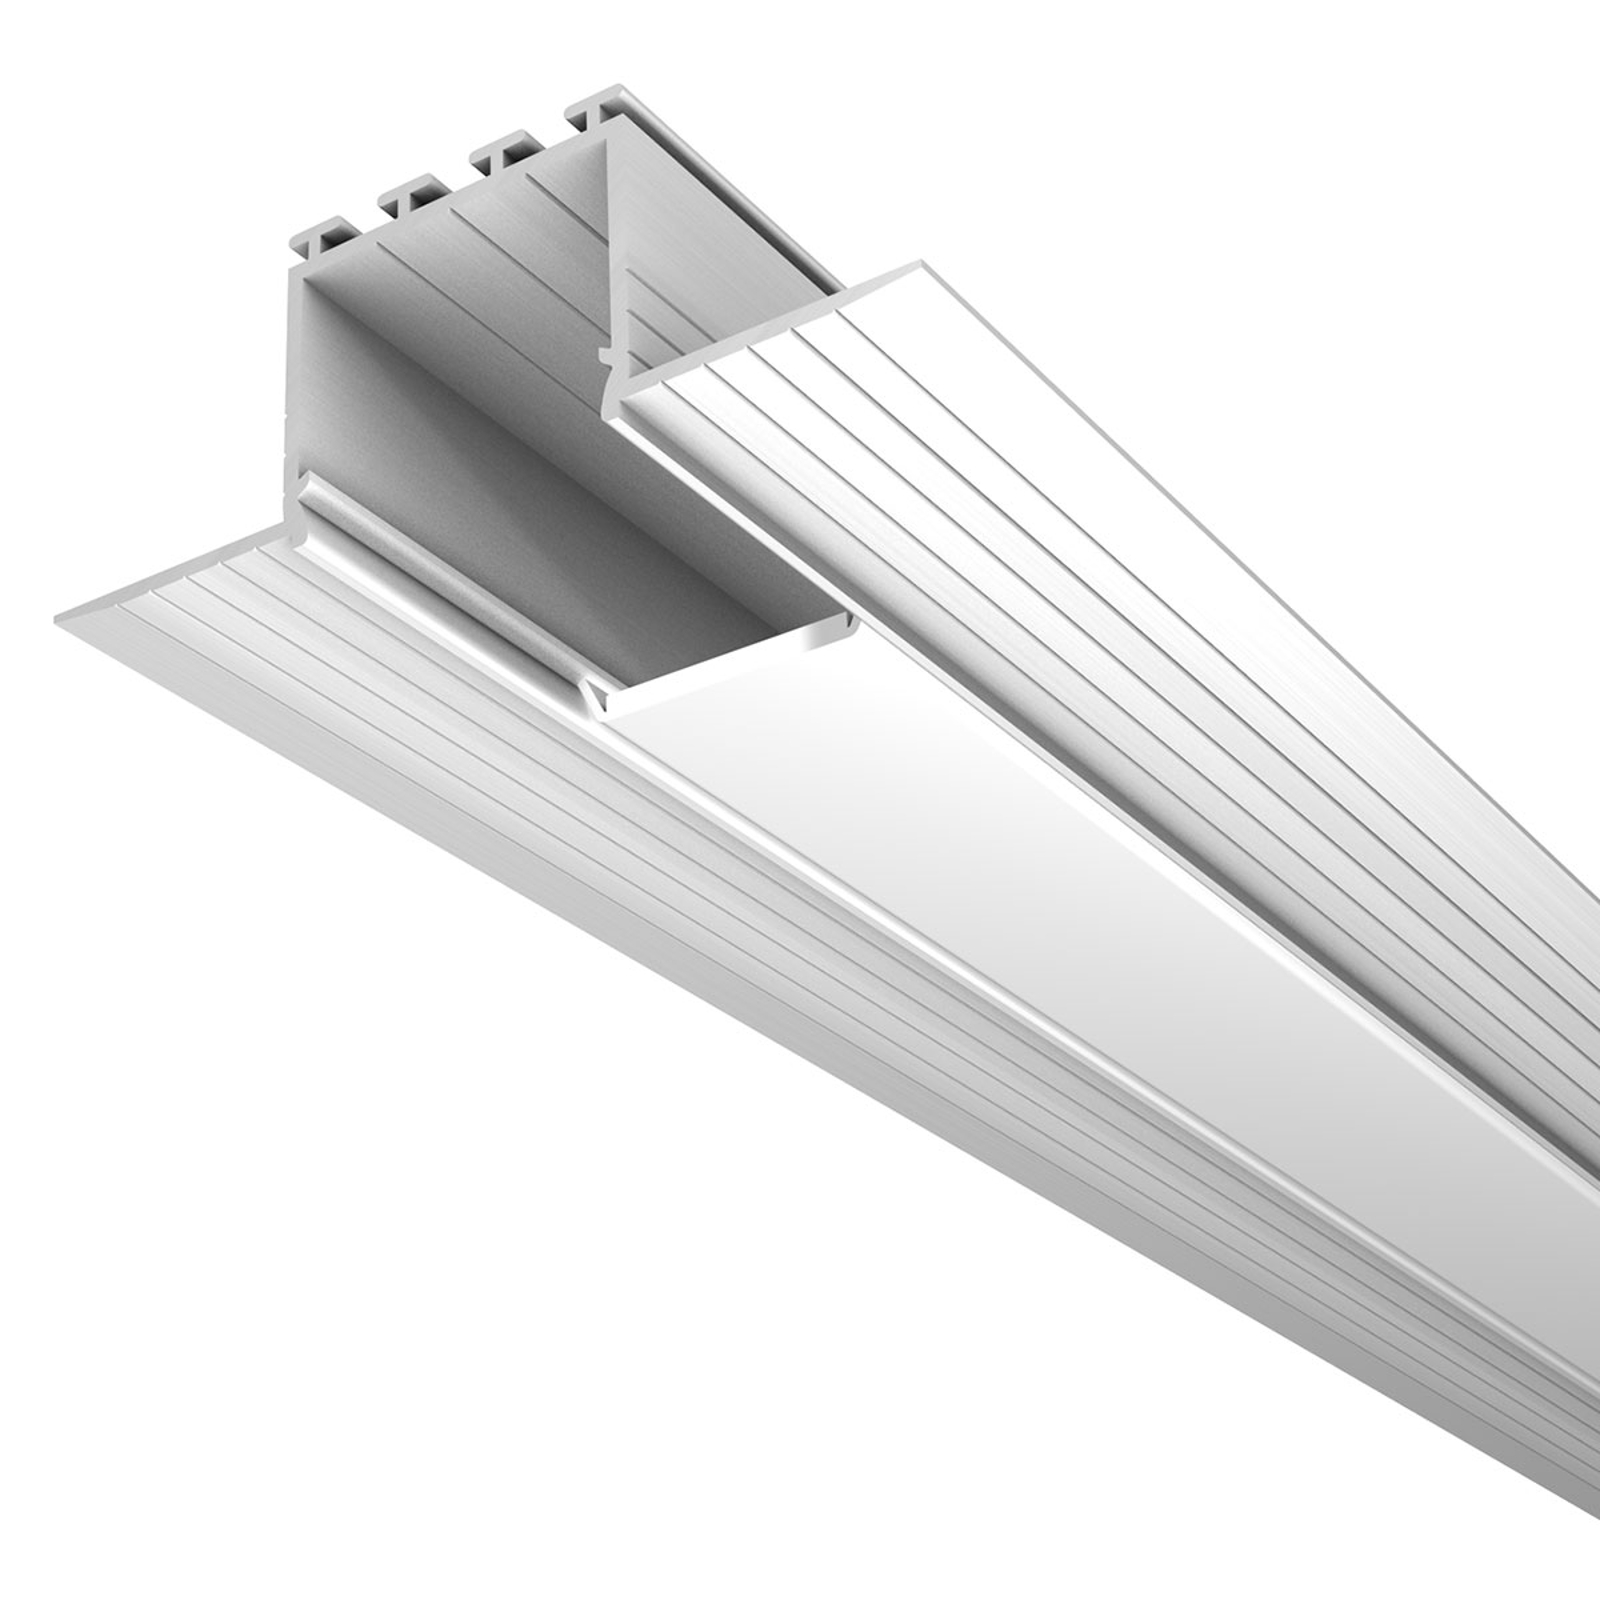 L24 LED Alu-Profil